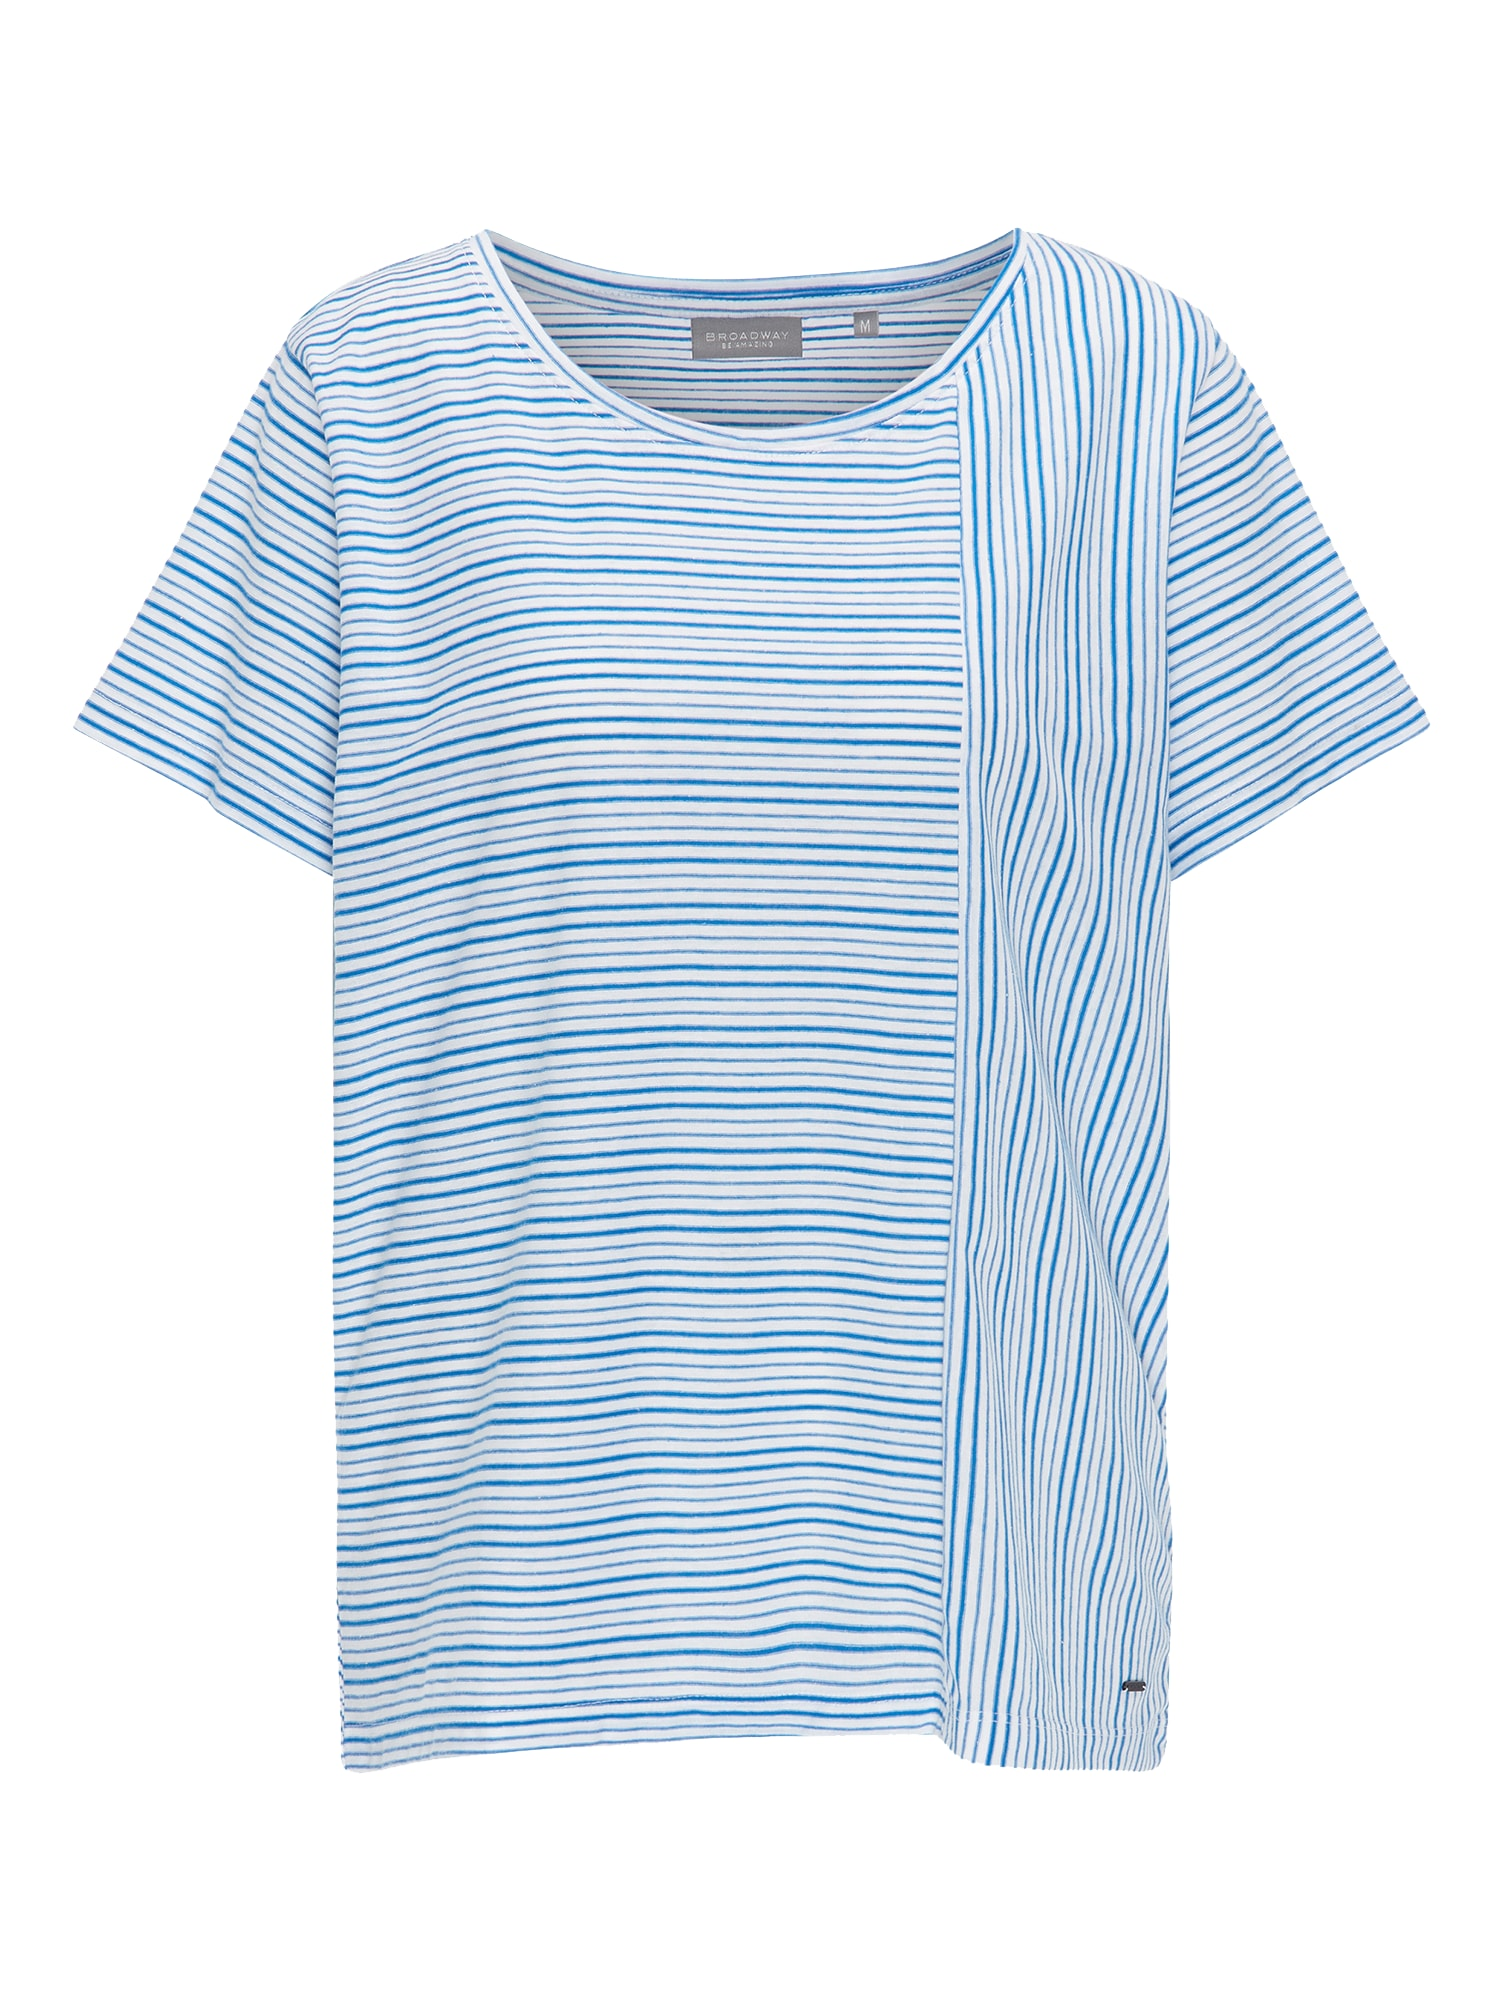 Tričko PETRA tmavě modrá bílá BROADWAY NYC FASHION